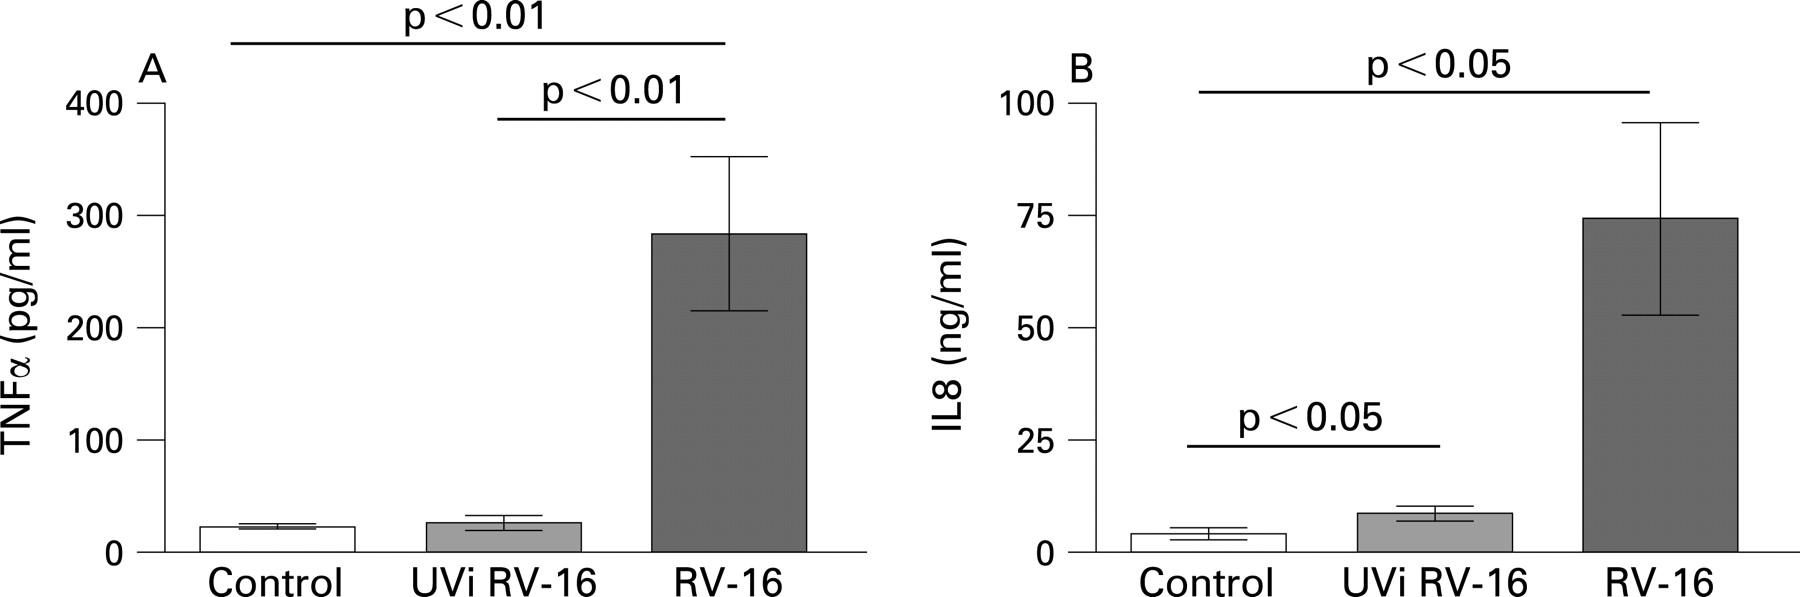 Rhinovirus exposure impairs immune responses to bacterial products